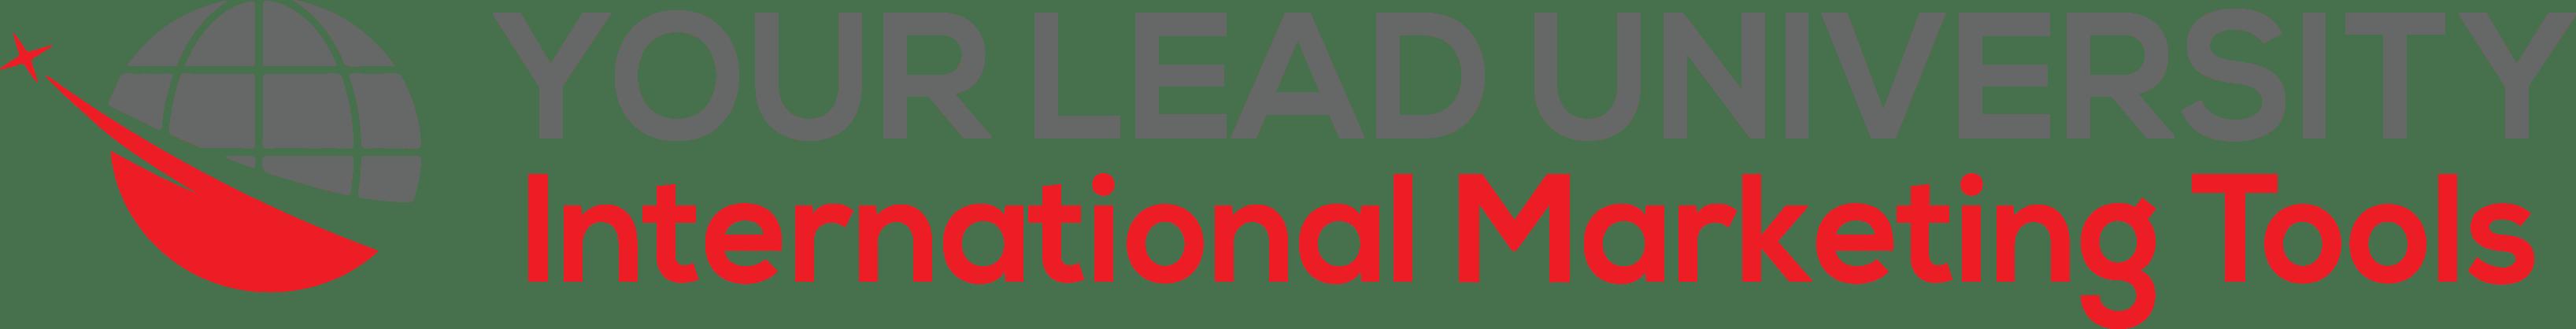 Your Lead University